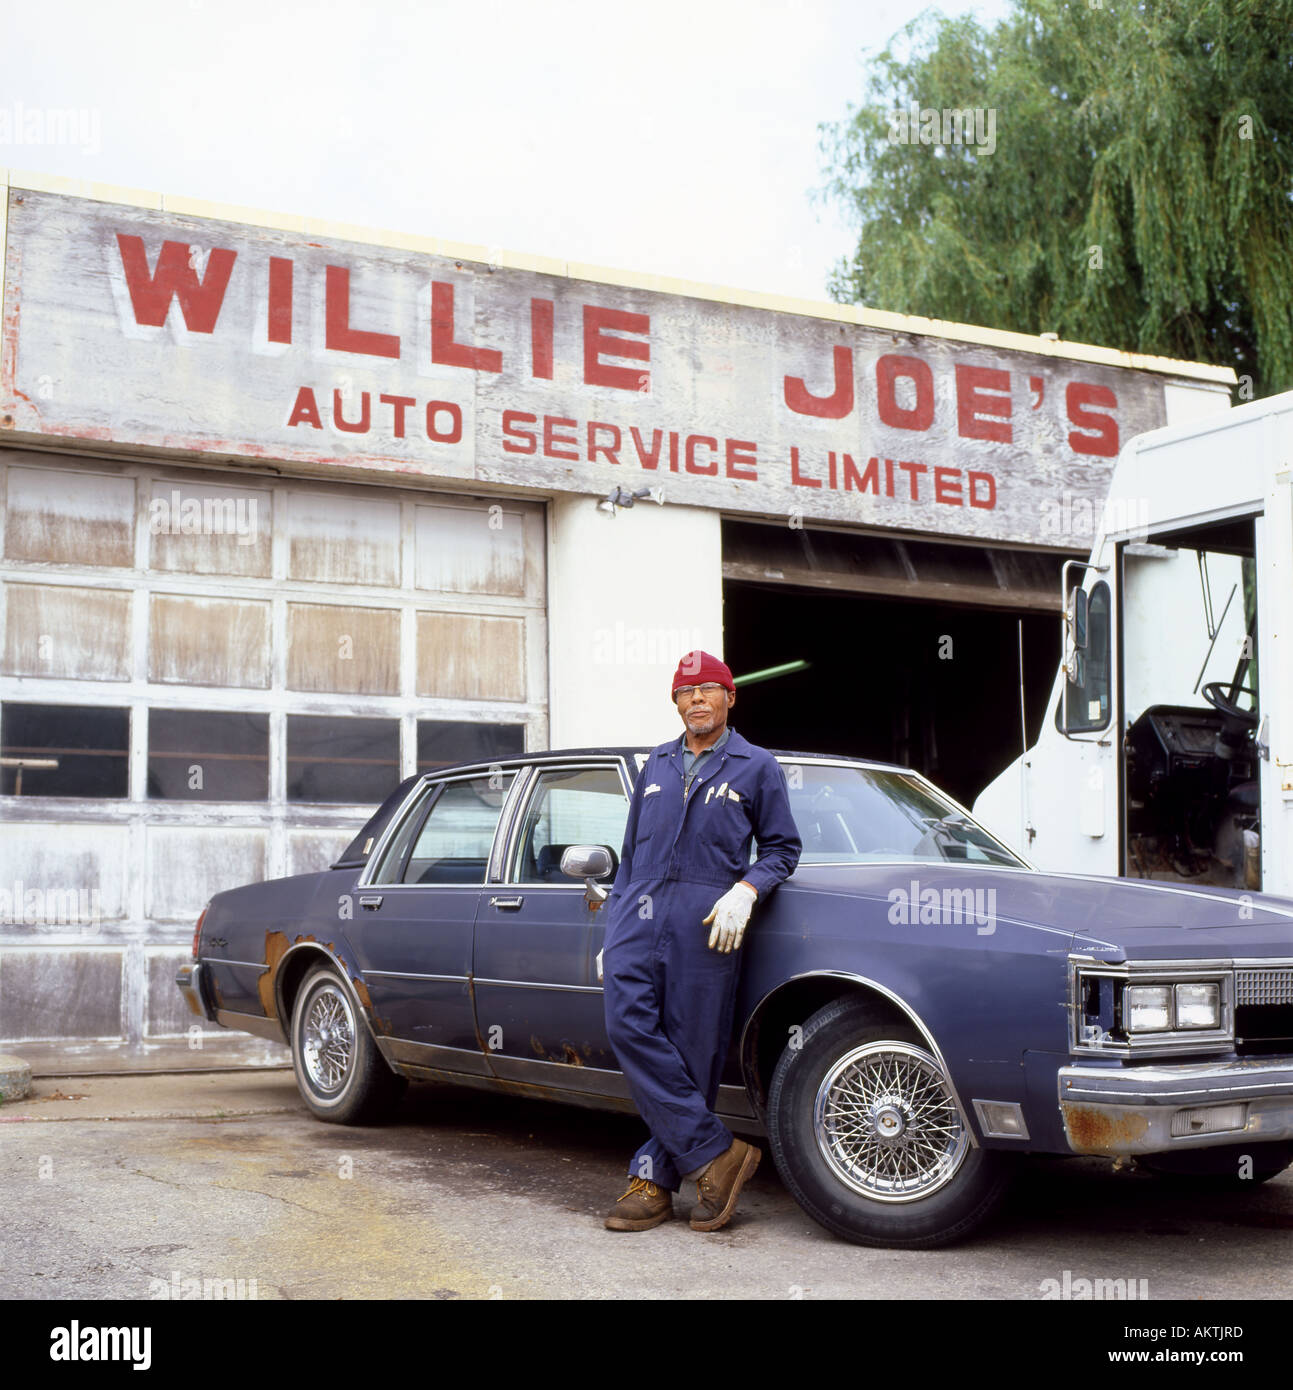 Joe'S Auto Repair >> Joes Auto Repair Stock Photos Joes Auto Repair Stock